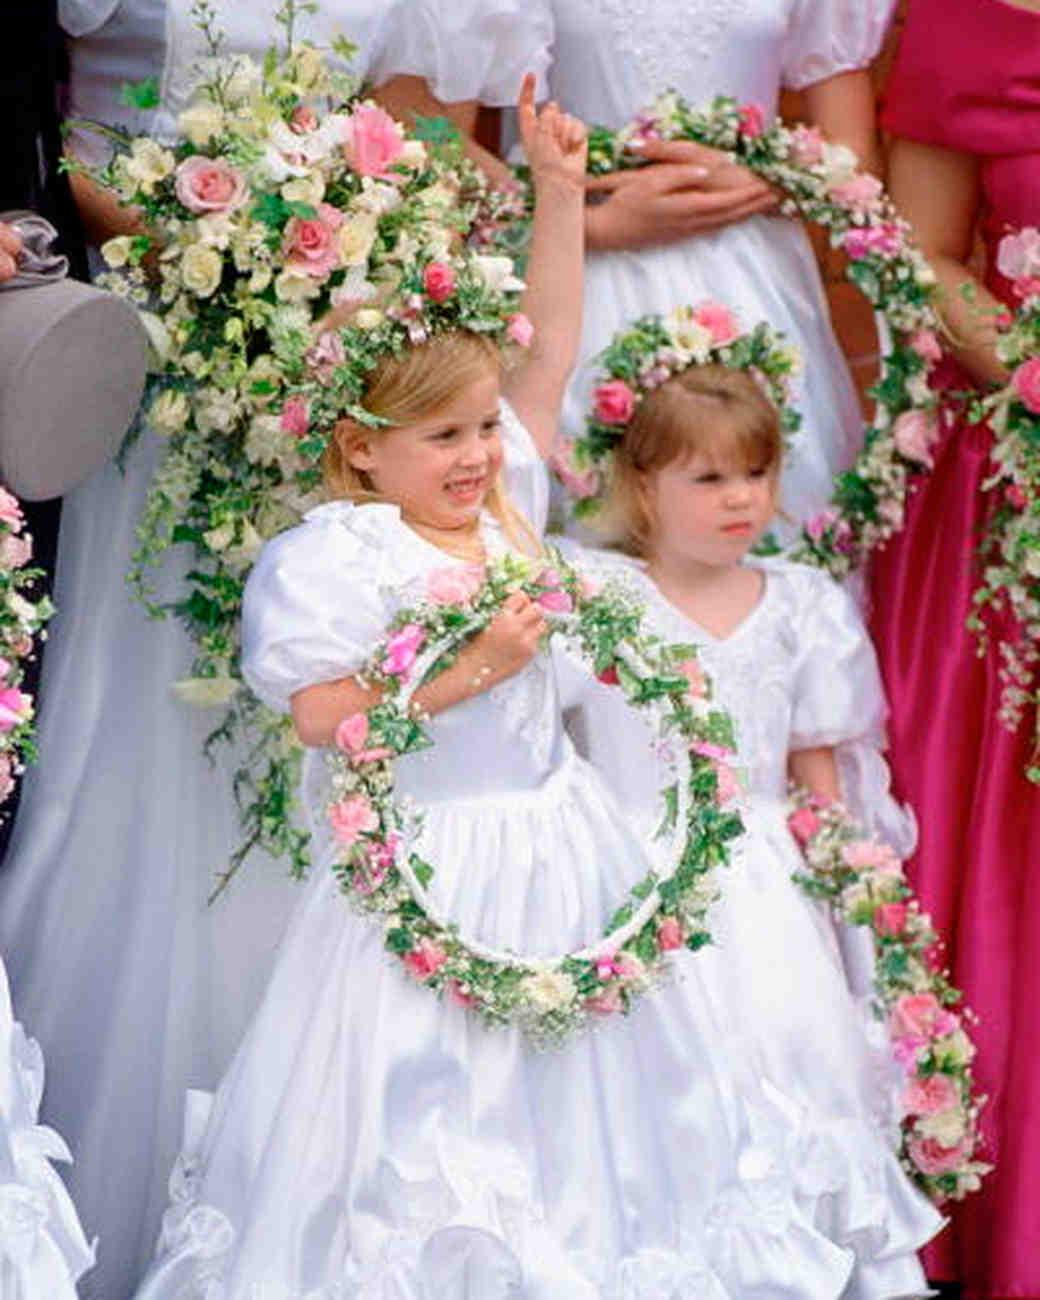 royal-children-wedding-52118533-0415.jpg